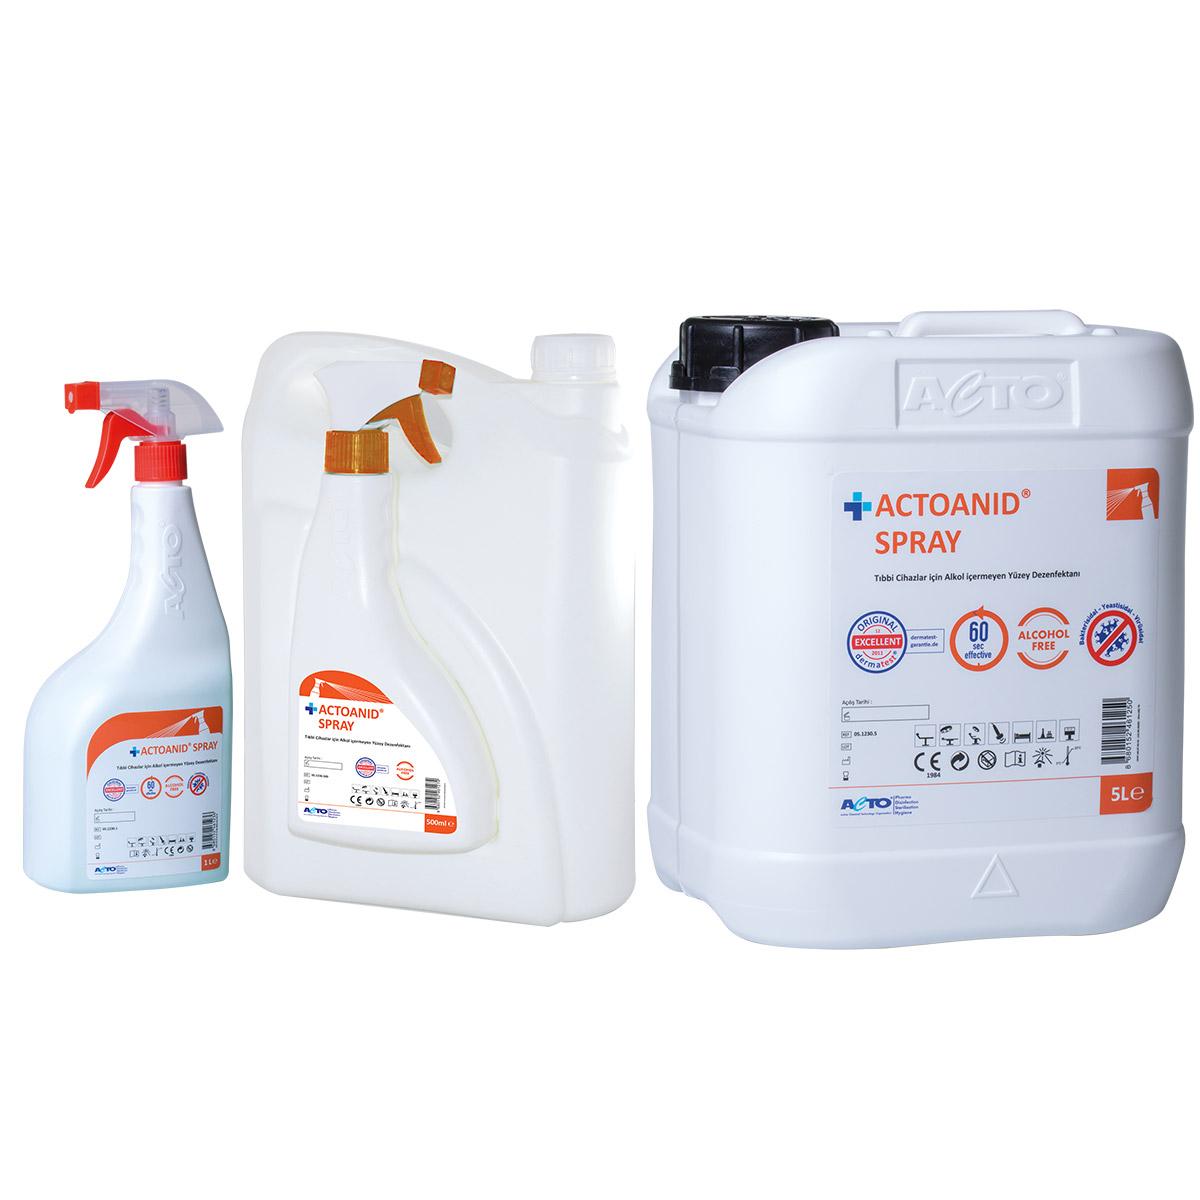 Actoanid Spray